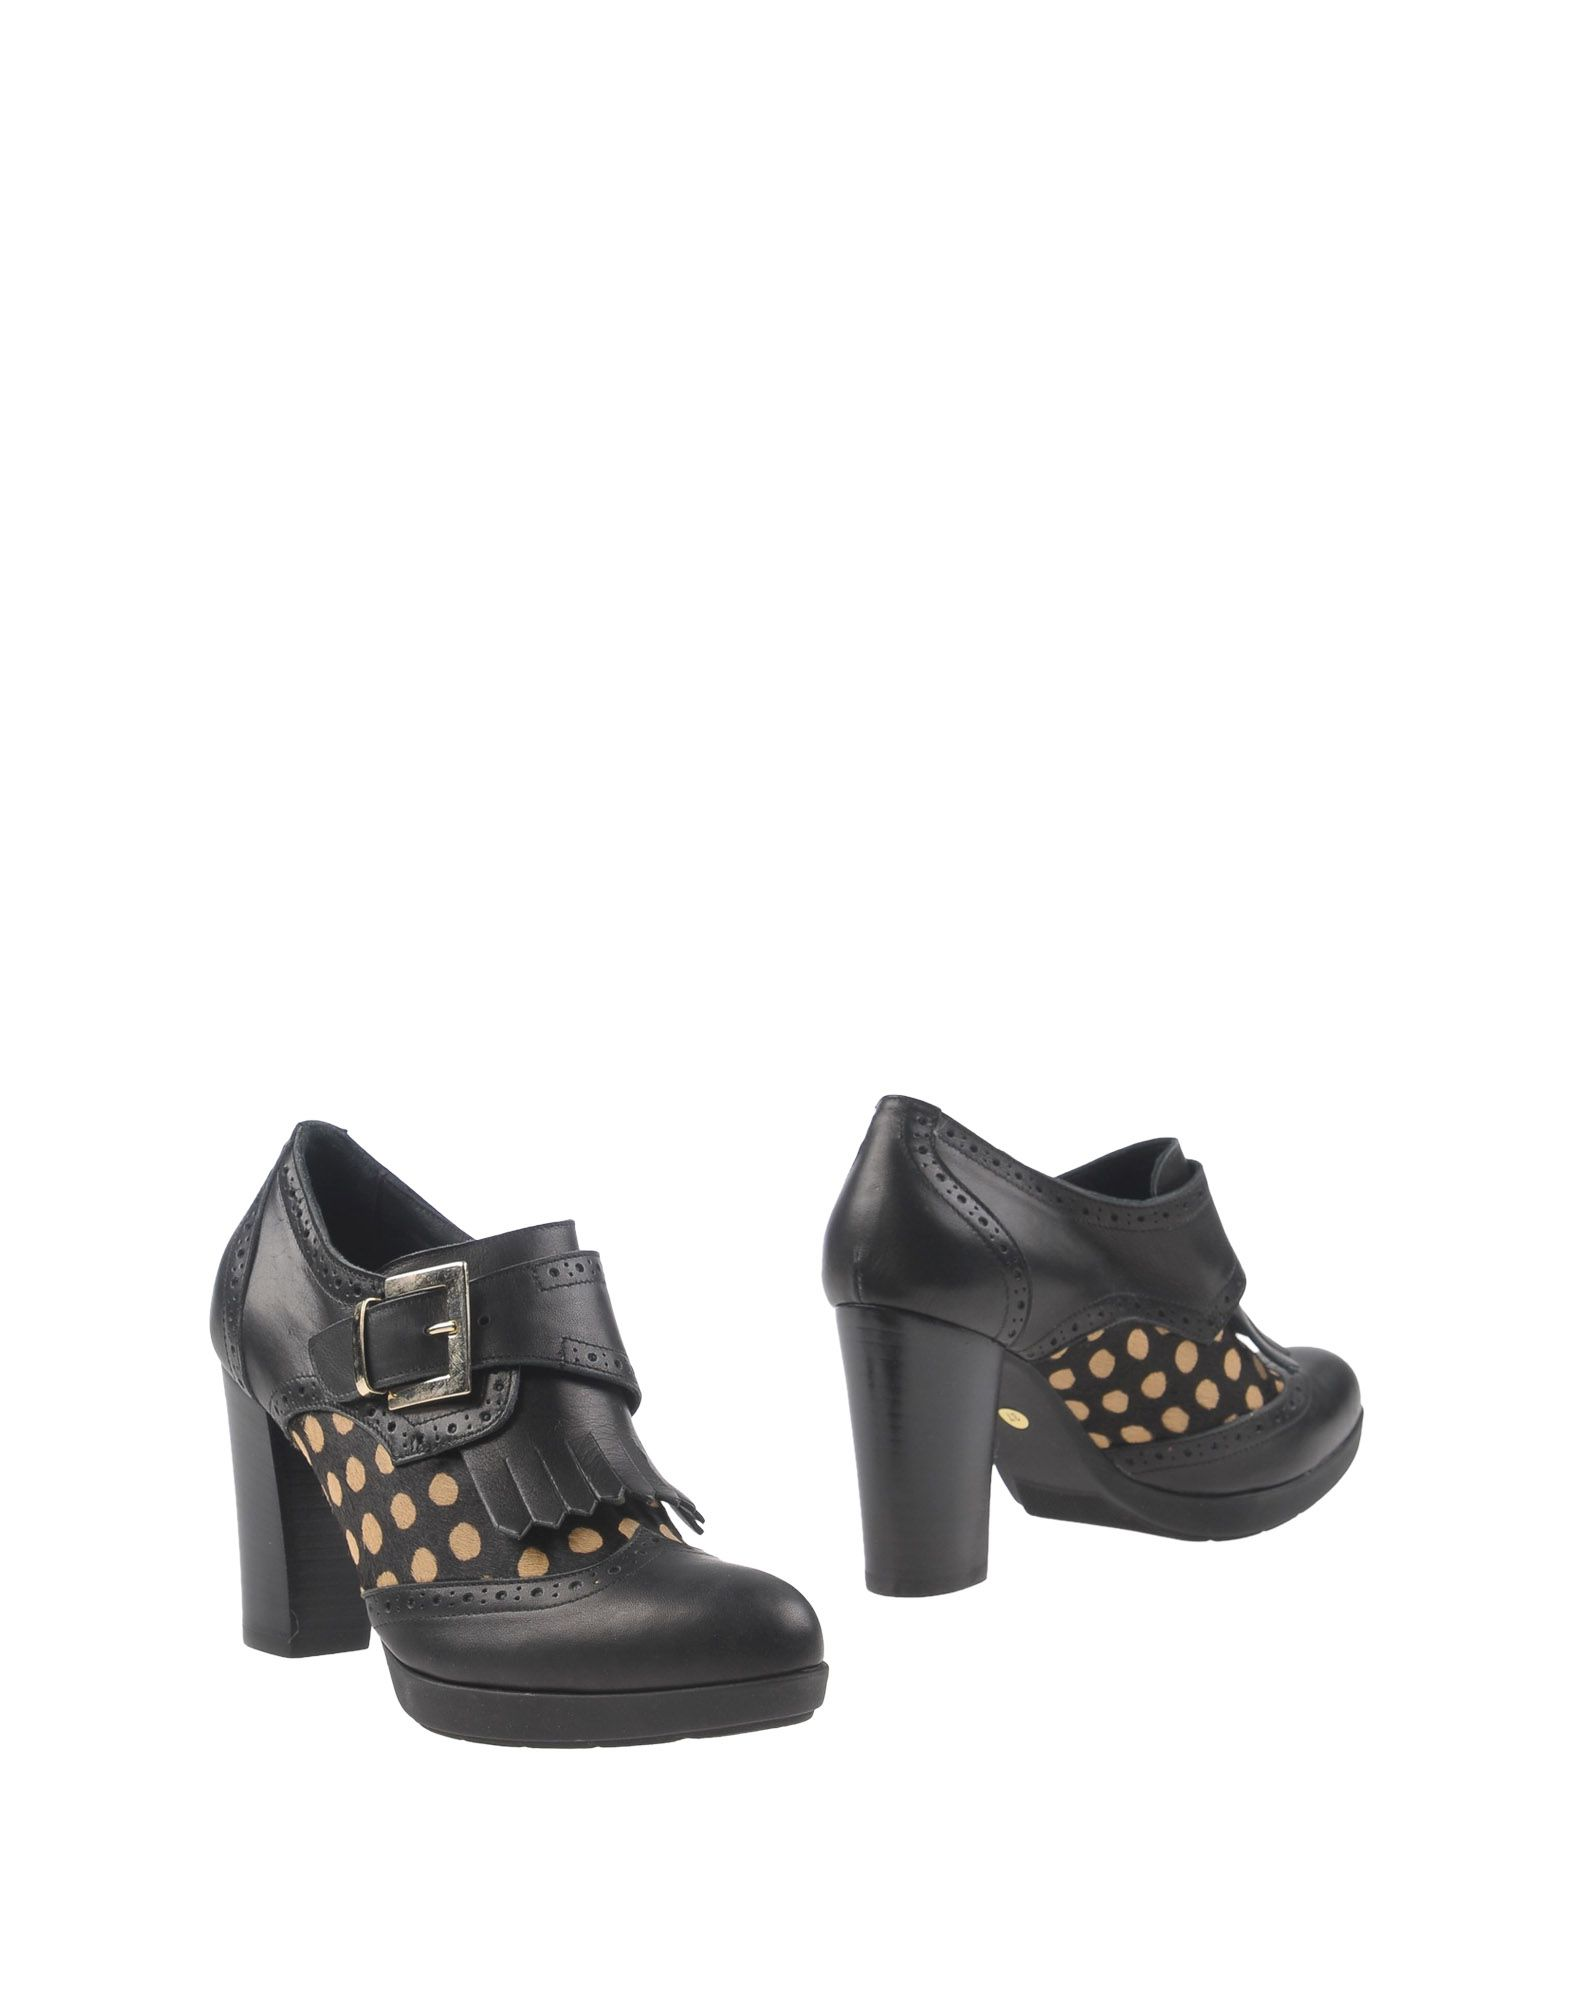 83c979b69fc Gionata Shoes - Gionata Women - YOOX Latvia